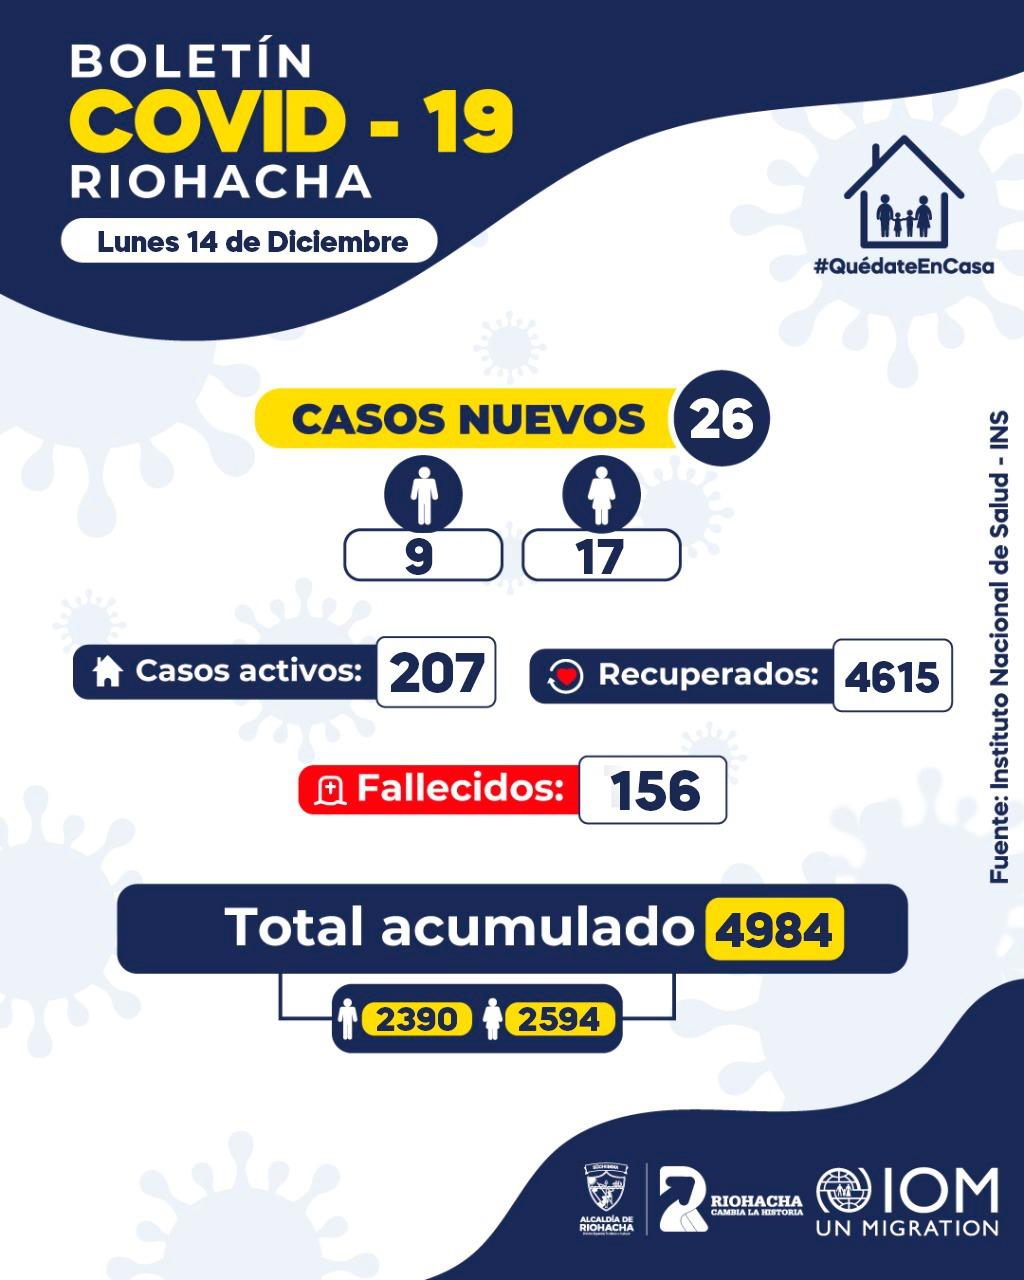 https://www.notasrosas.com/Covid-19 en Riohacha 14-12-2020